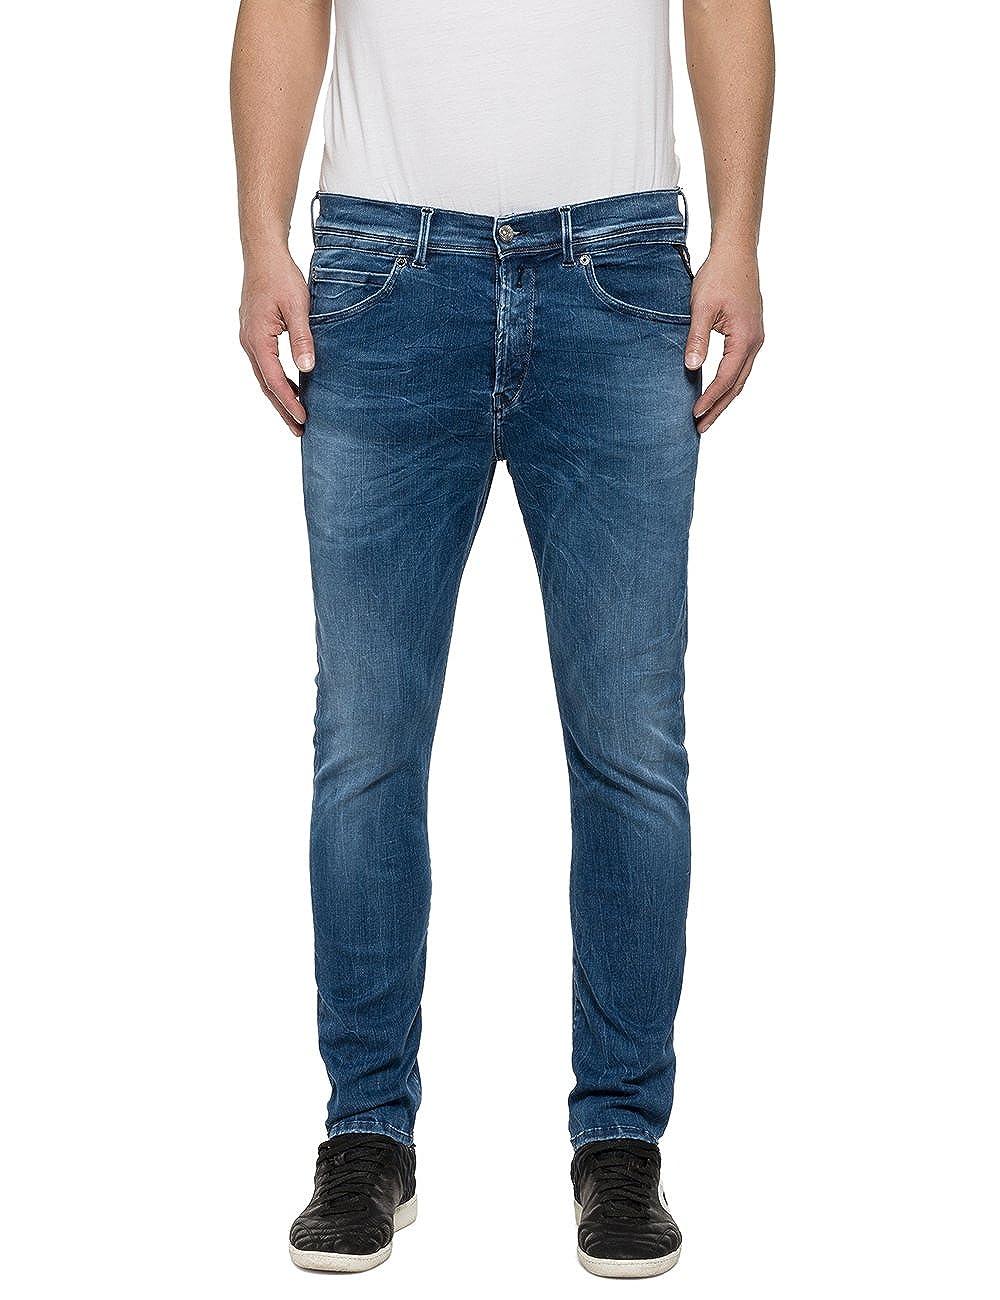 REPLAY Ezhir, Jeans para Hombre